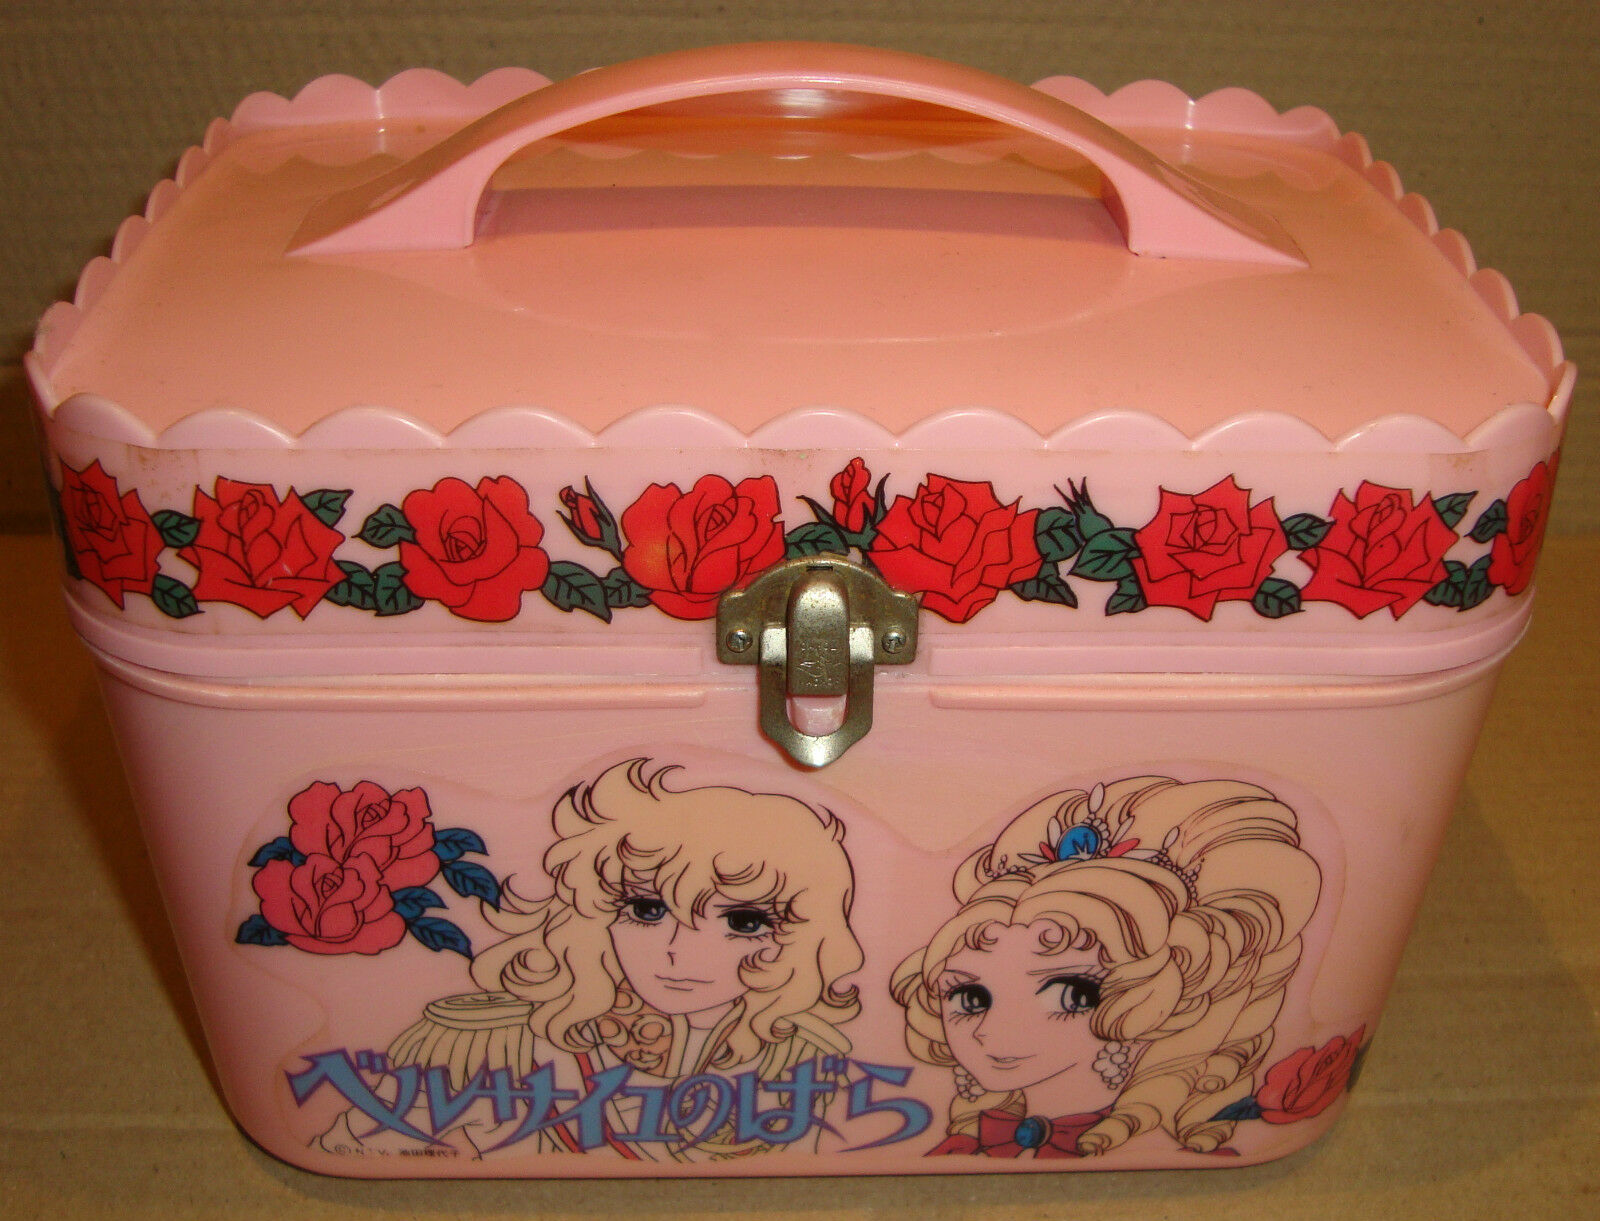 LADY OSCAR BEAUTY CASE  ANNI 80 ベルサイユのばら (CANDY CANDY/MEMOLE/CREAMY MAMI))